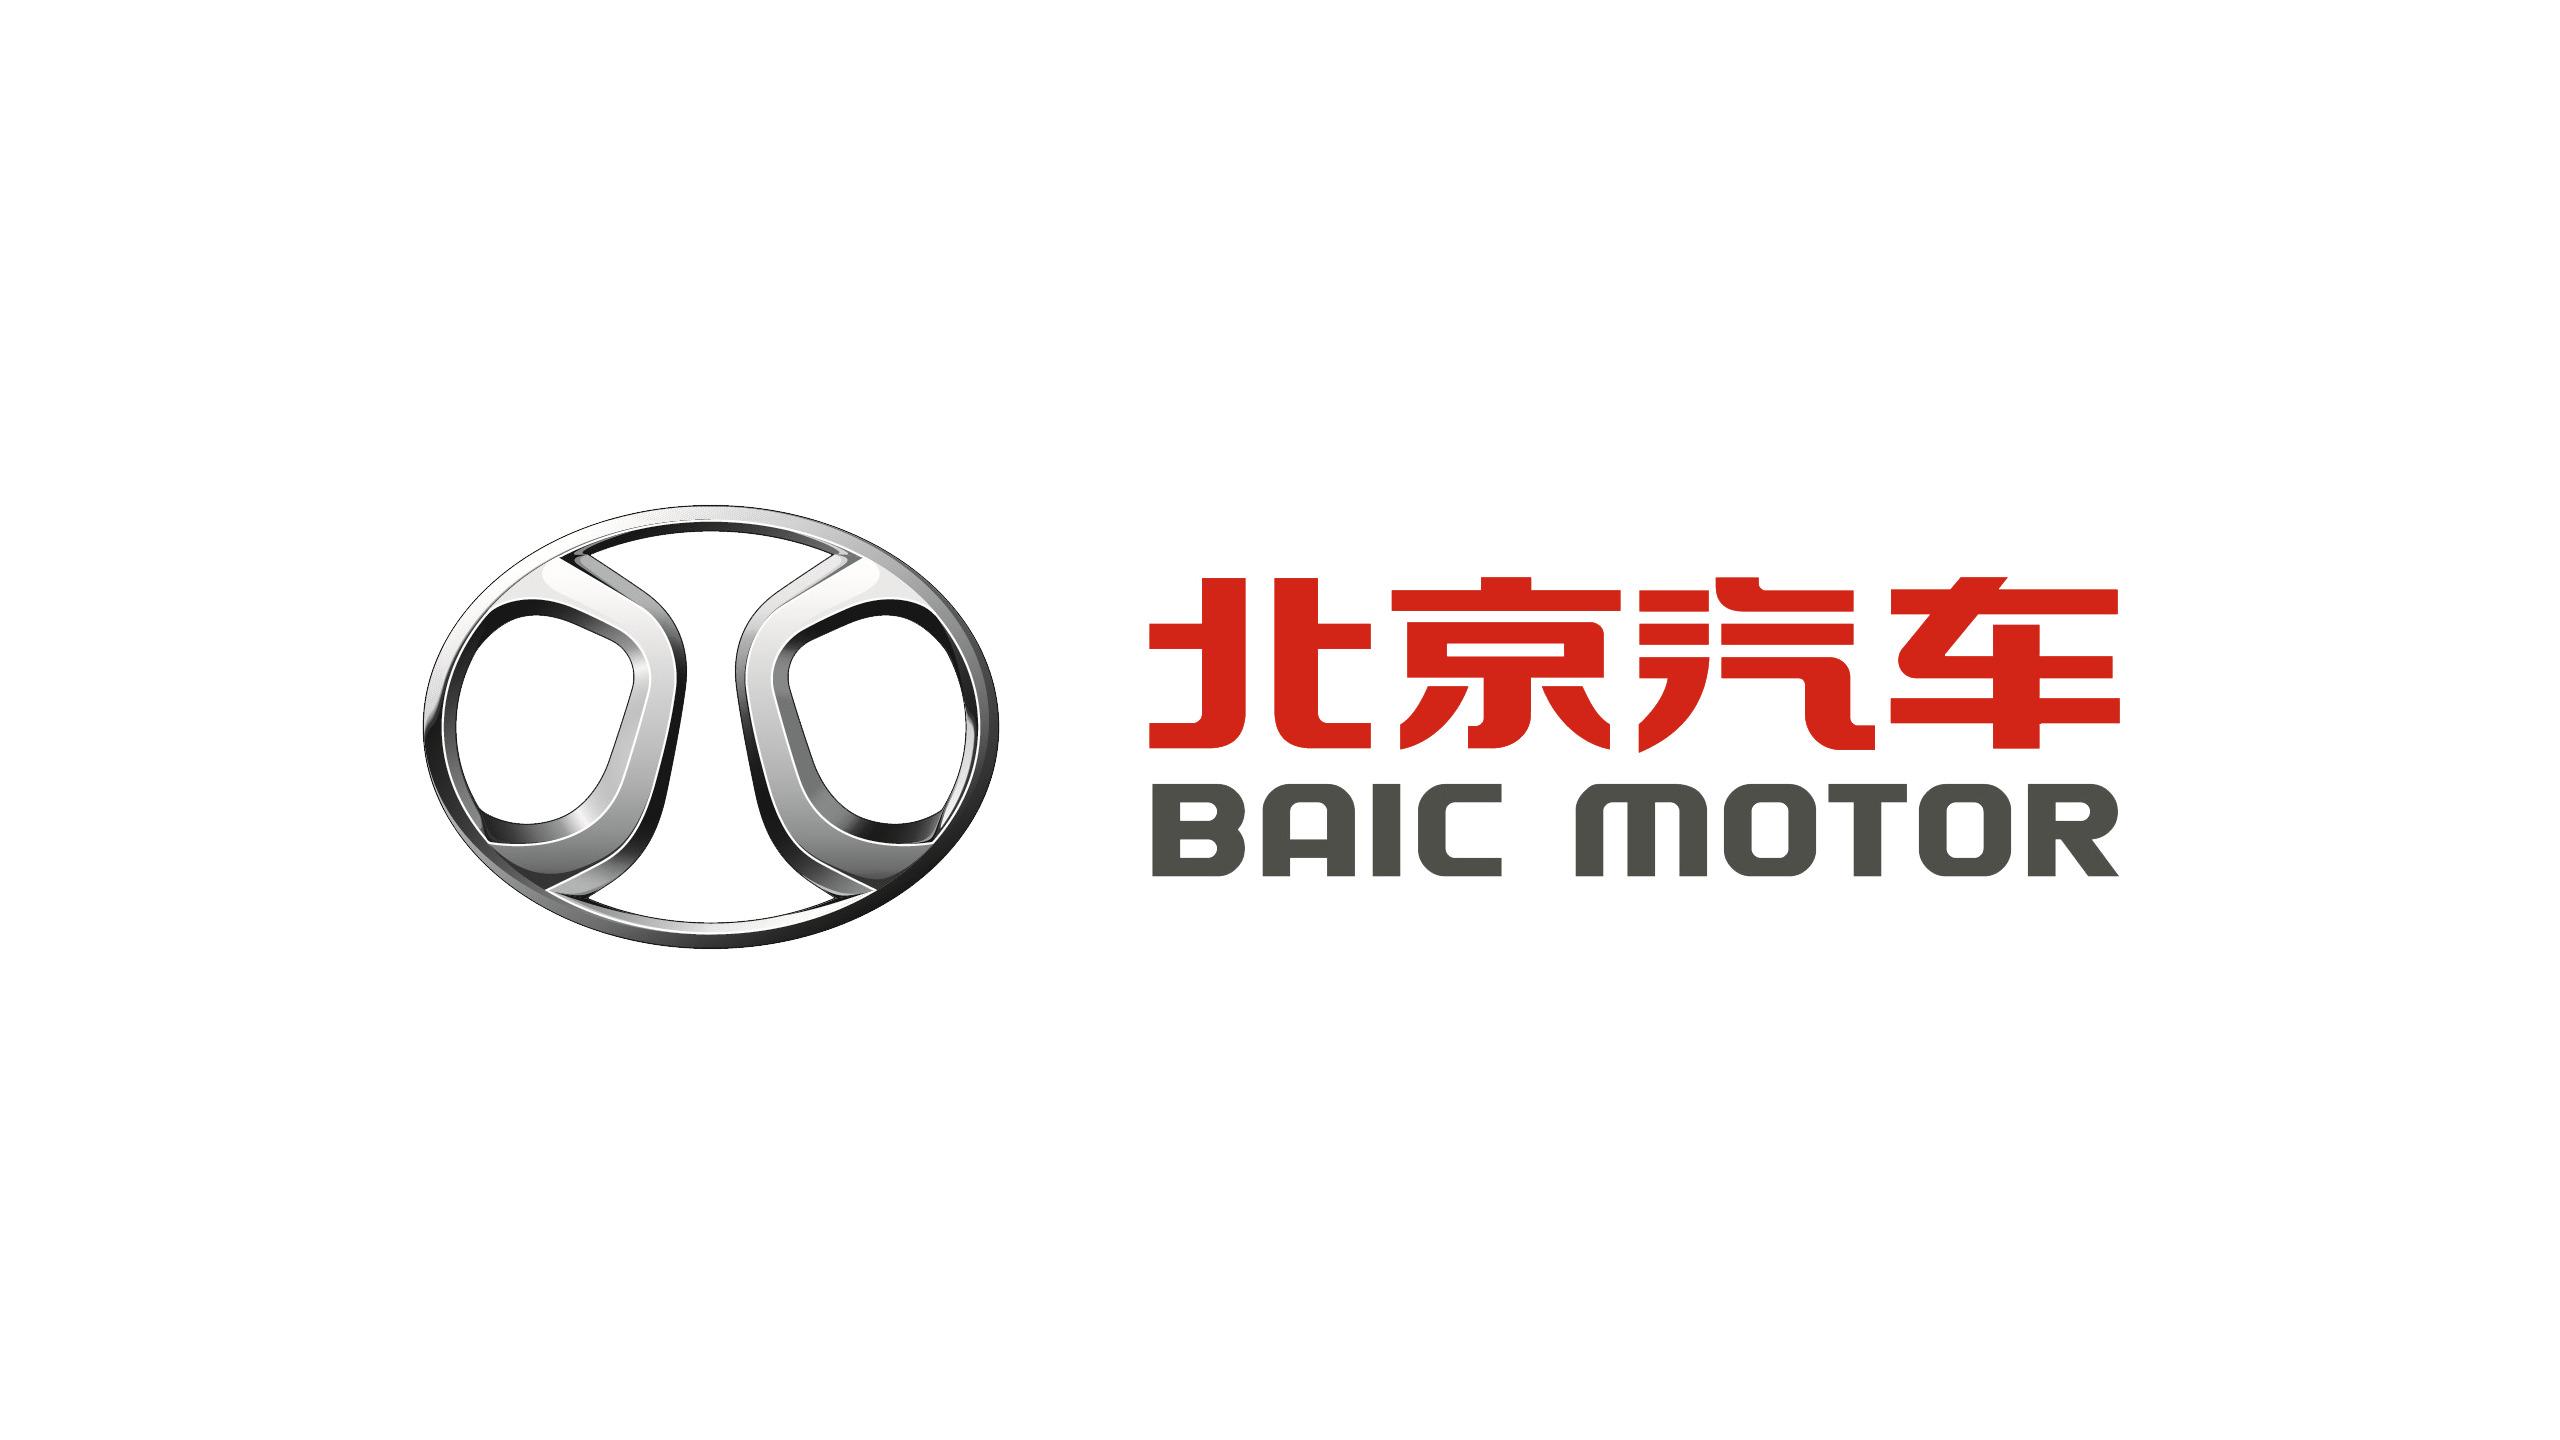 Imagen logo de BAIC Motor